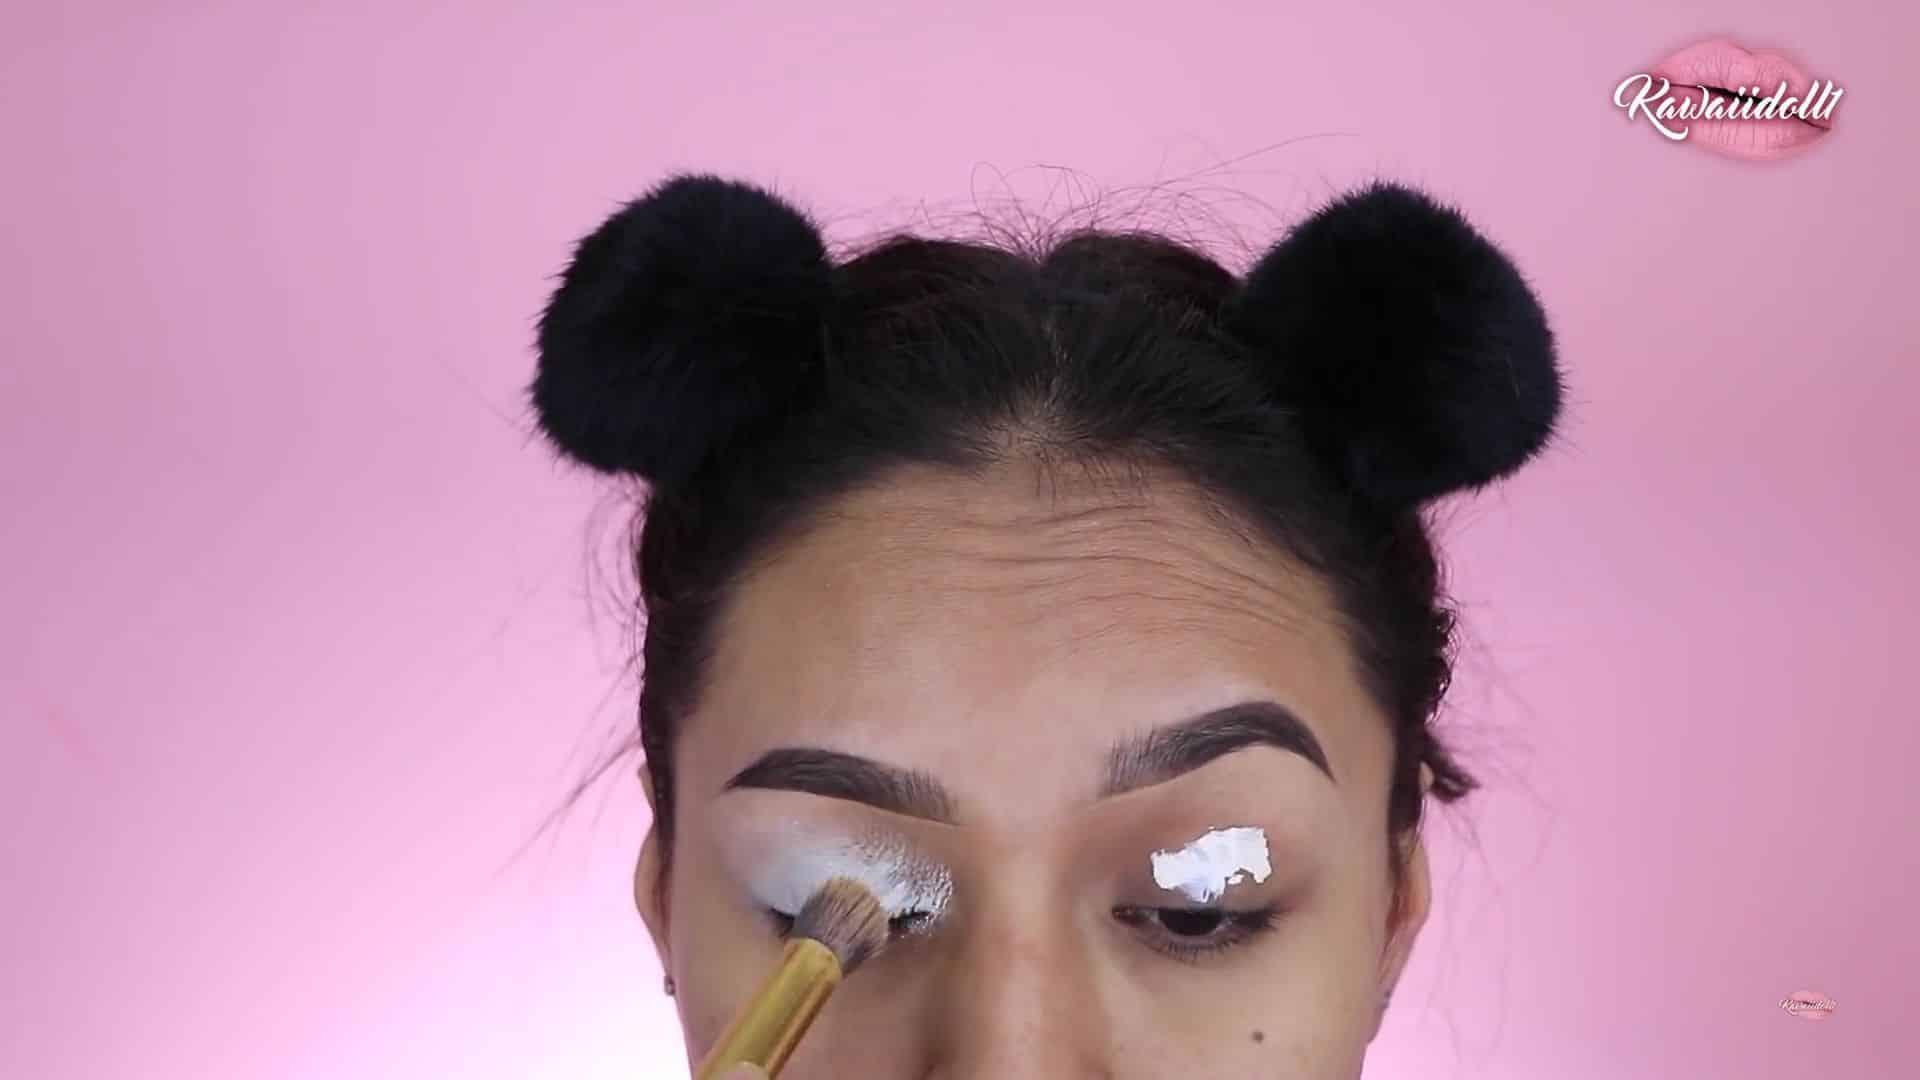 maquillaje de fantasía rapunzel 2020 kawaiidoll1 difuminado del corrector.